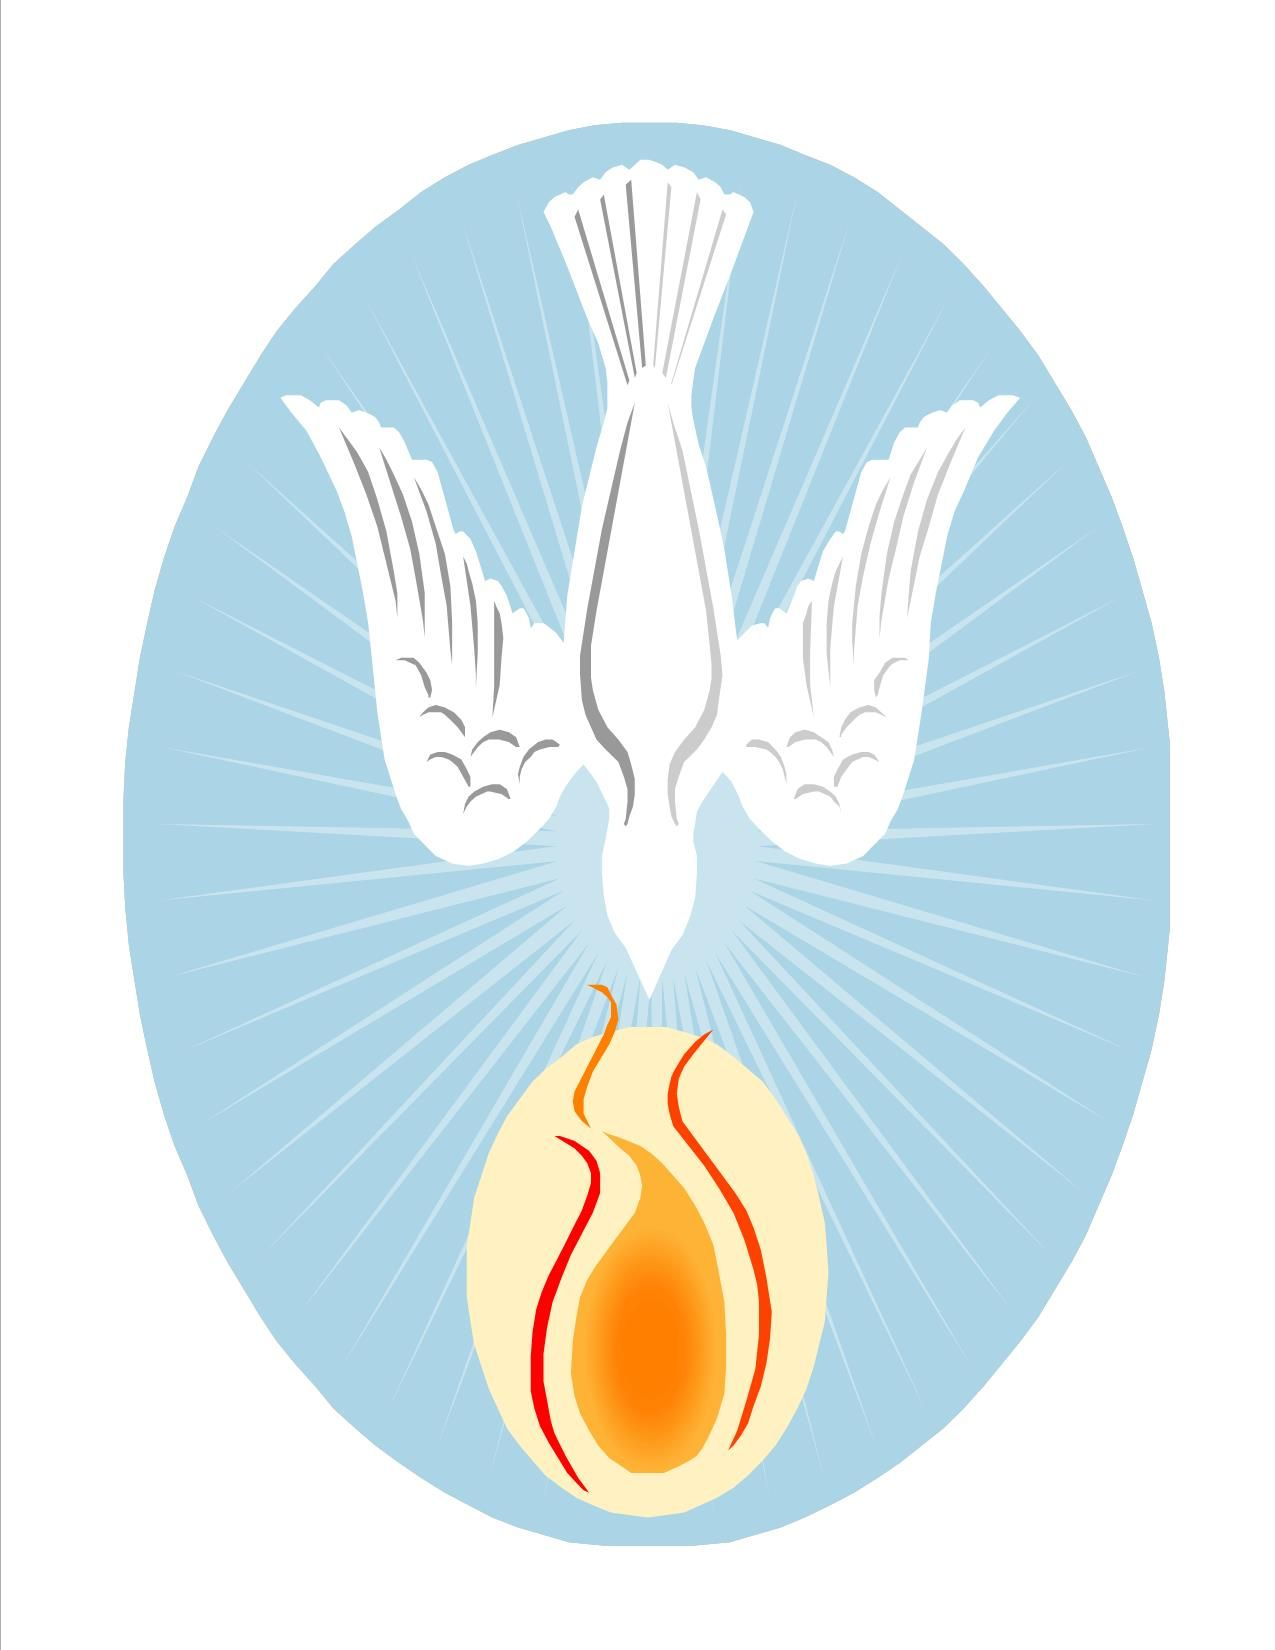 Image Result For Reconciliation Sacrament Symbols